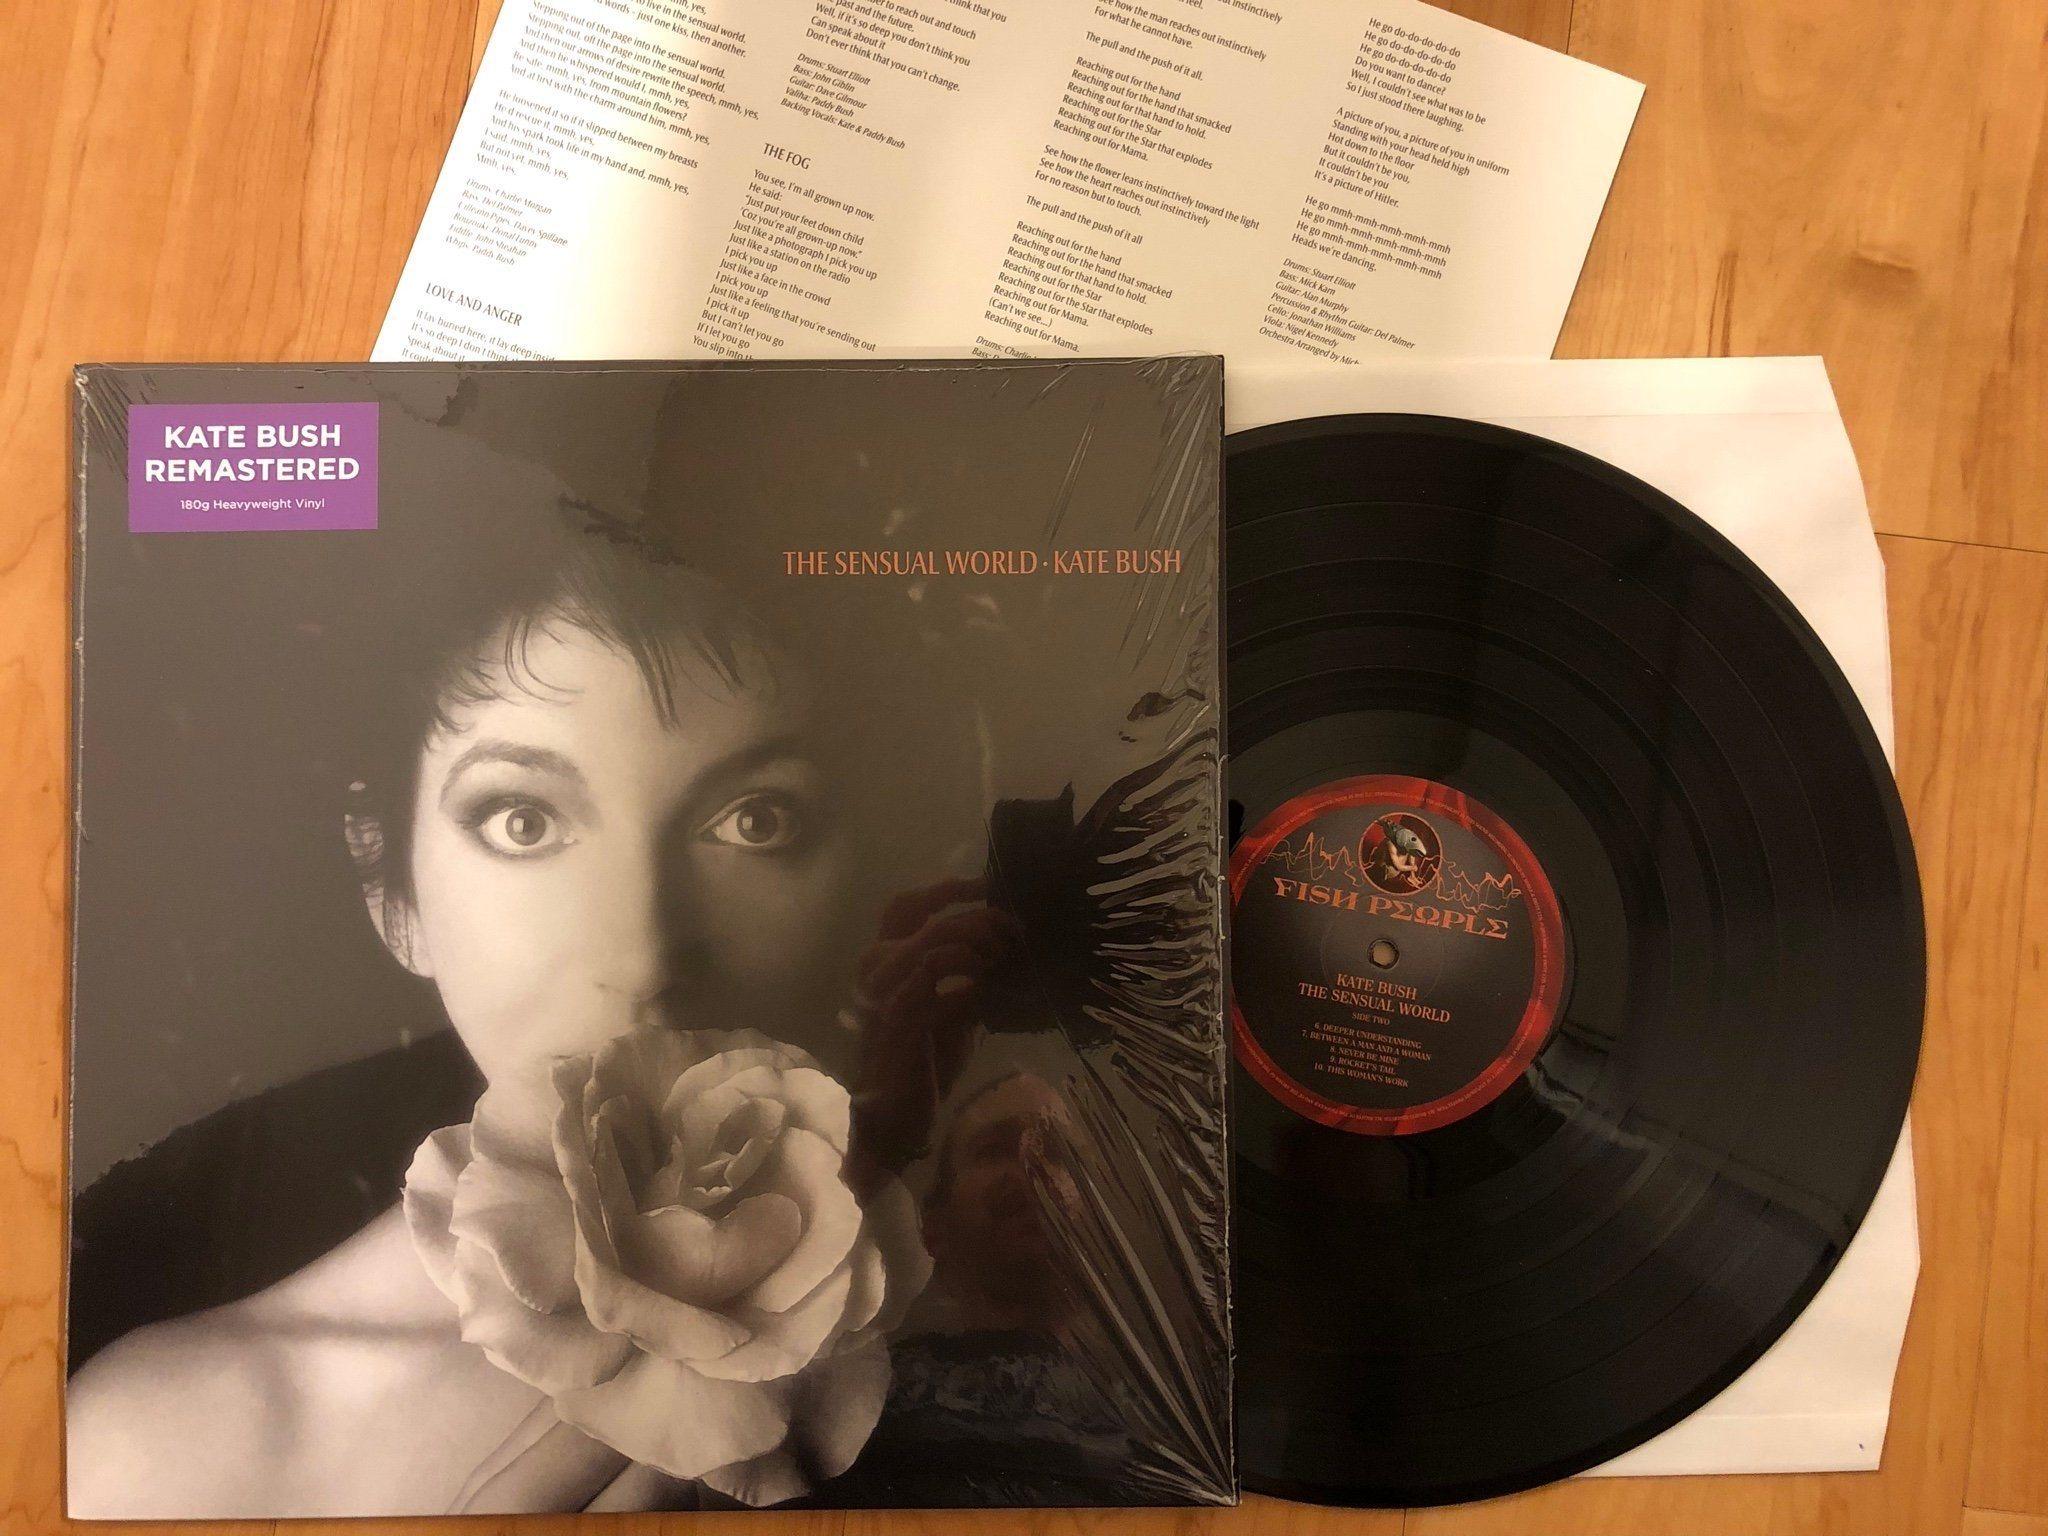 Kate Bush - The Sensual World LP Remastered (346306660) ᐈ